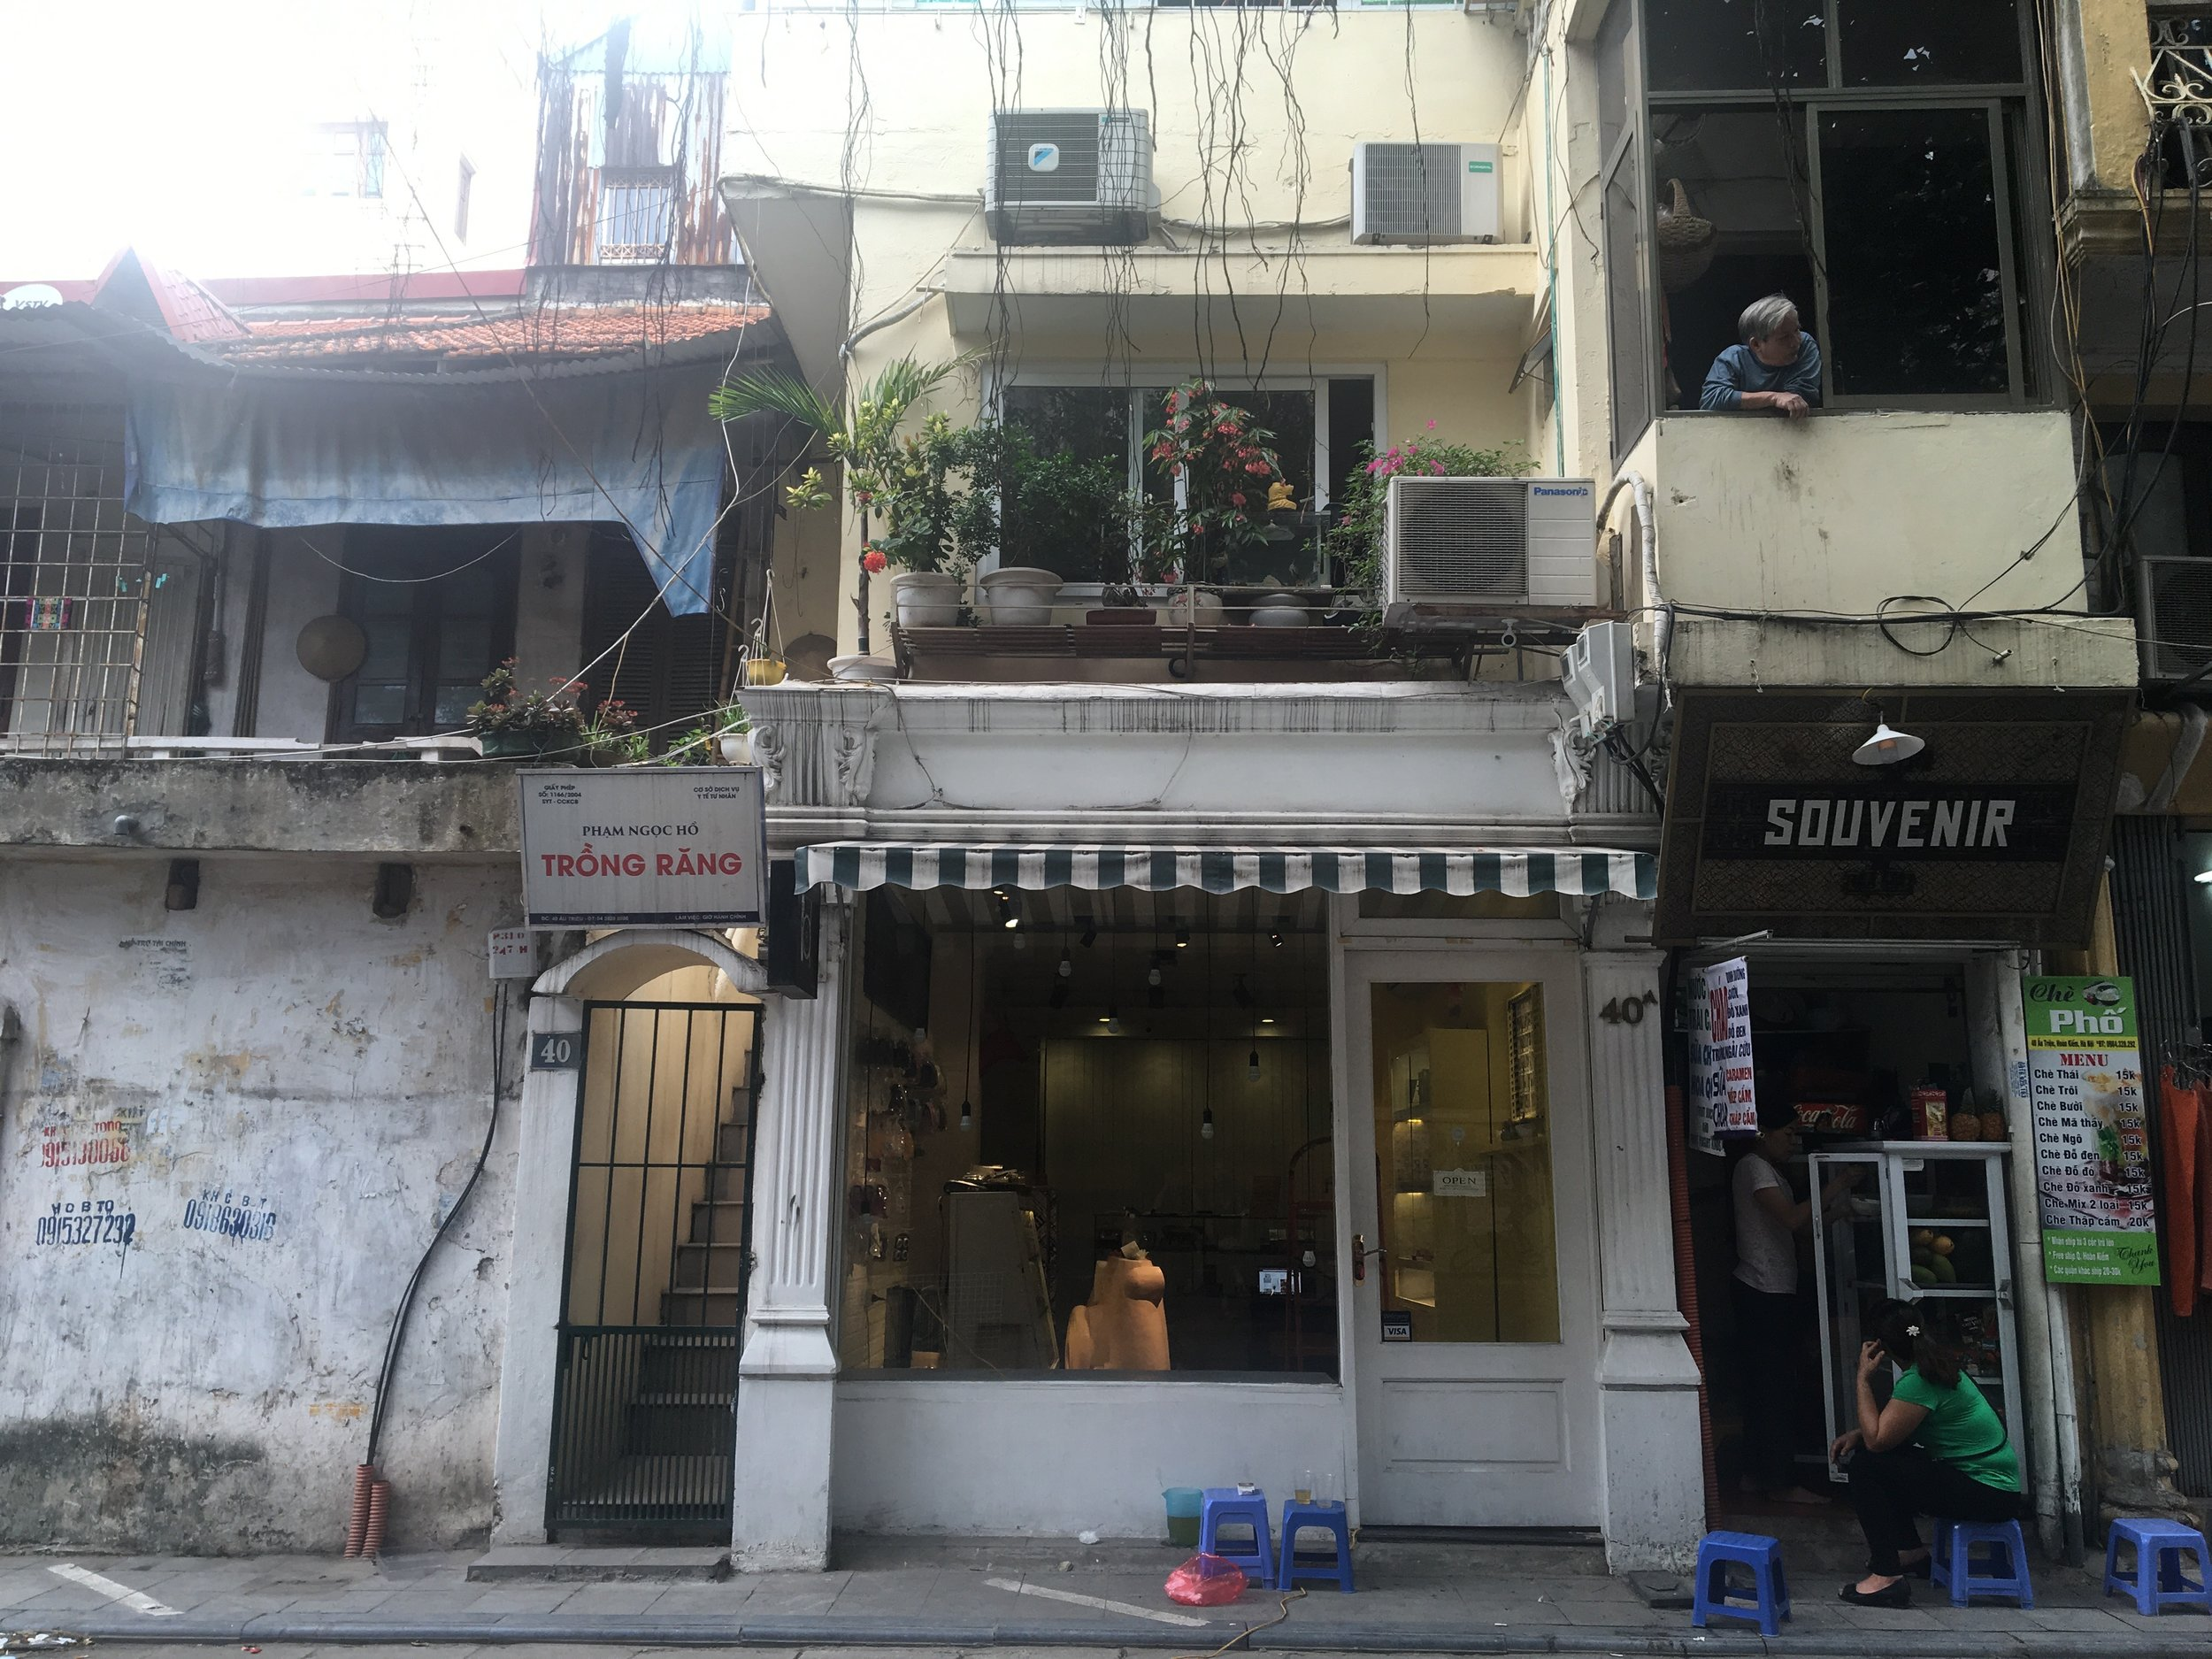 Last day in Hanoi on my favorite little street